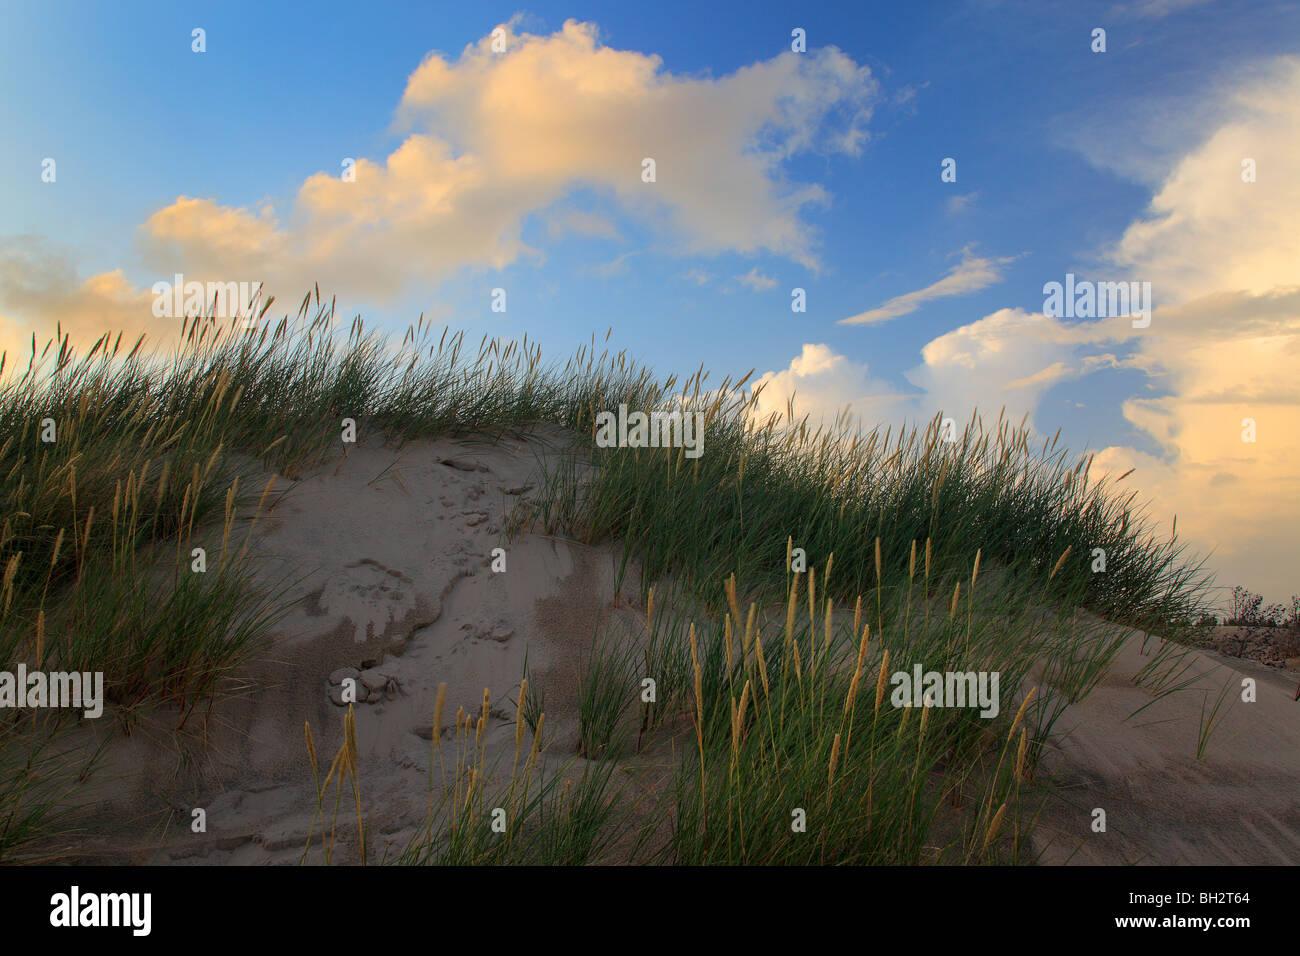 Raabjerg Mile est une migration entre les dunes côtières Skagen et Frederikshavn, Danemark. Photo Stock